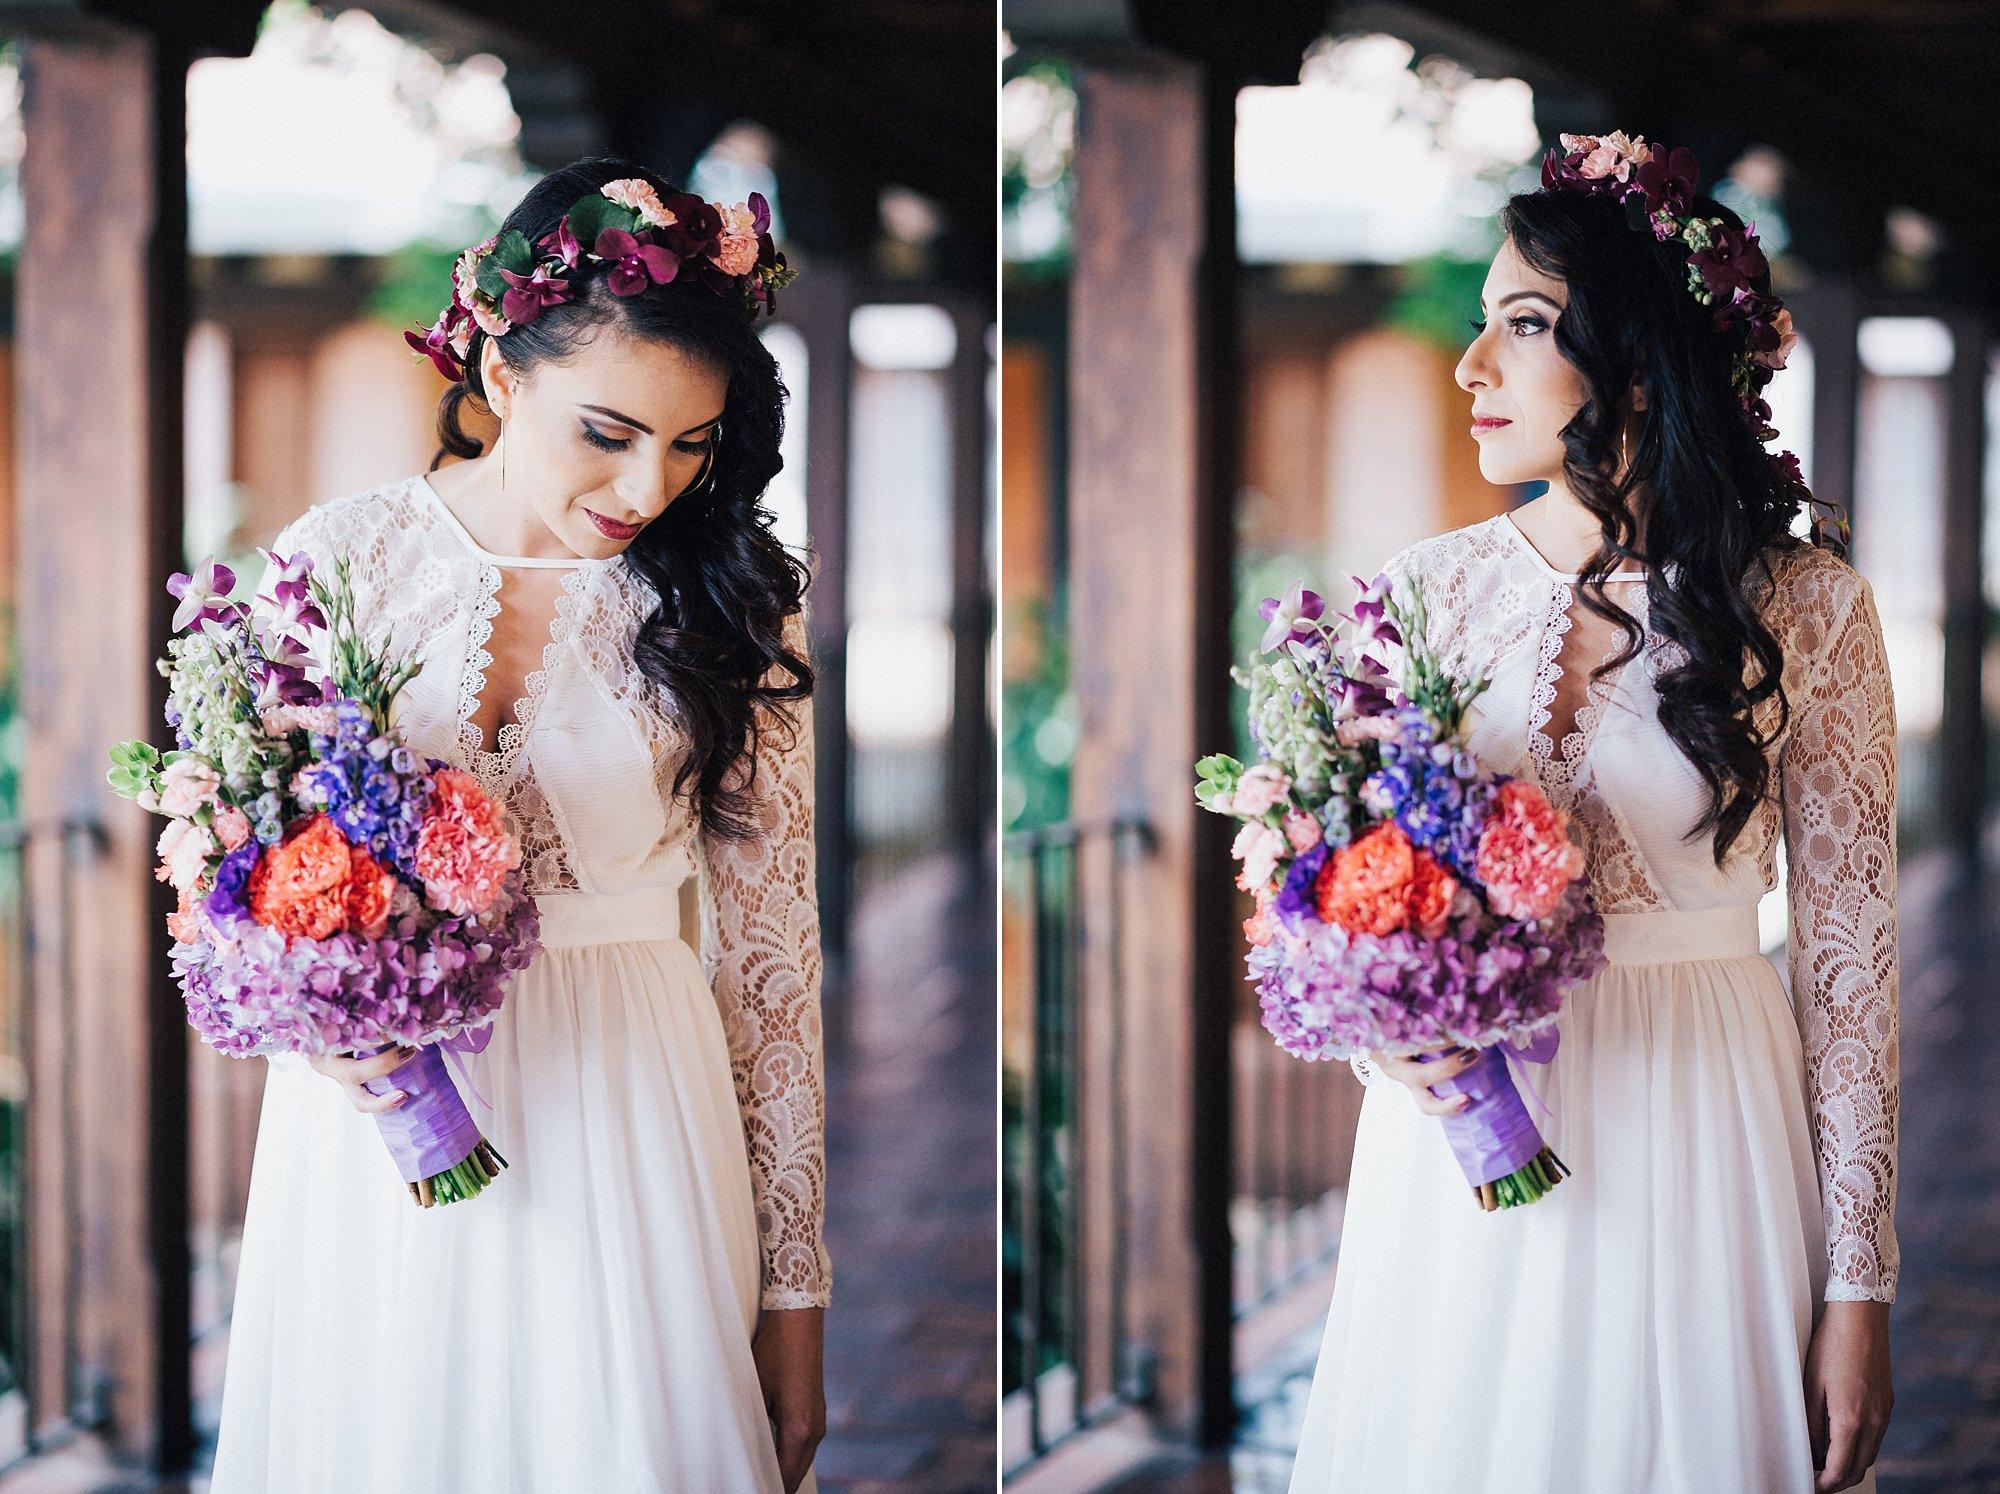 alex-yazmin-wedding-photographer-antigua-guatemala-064